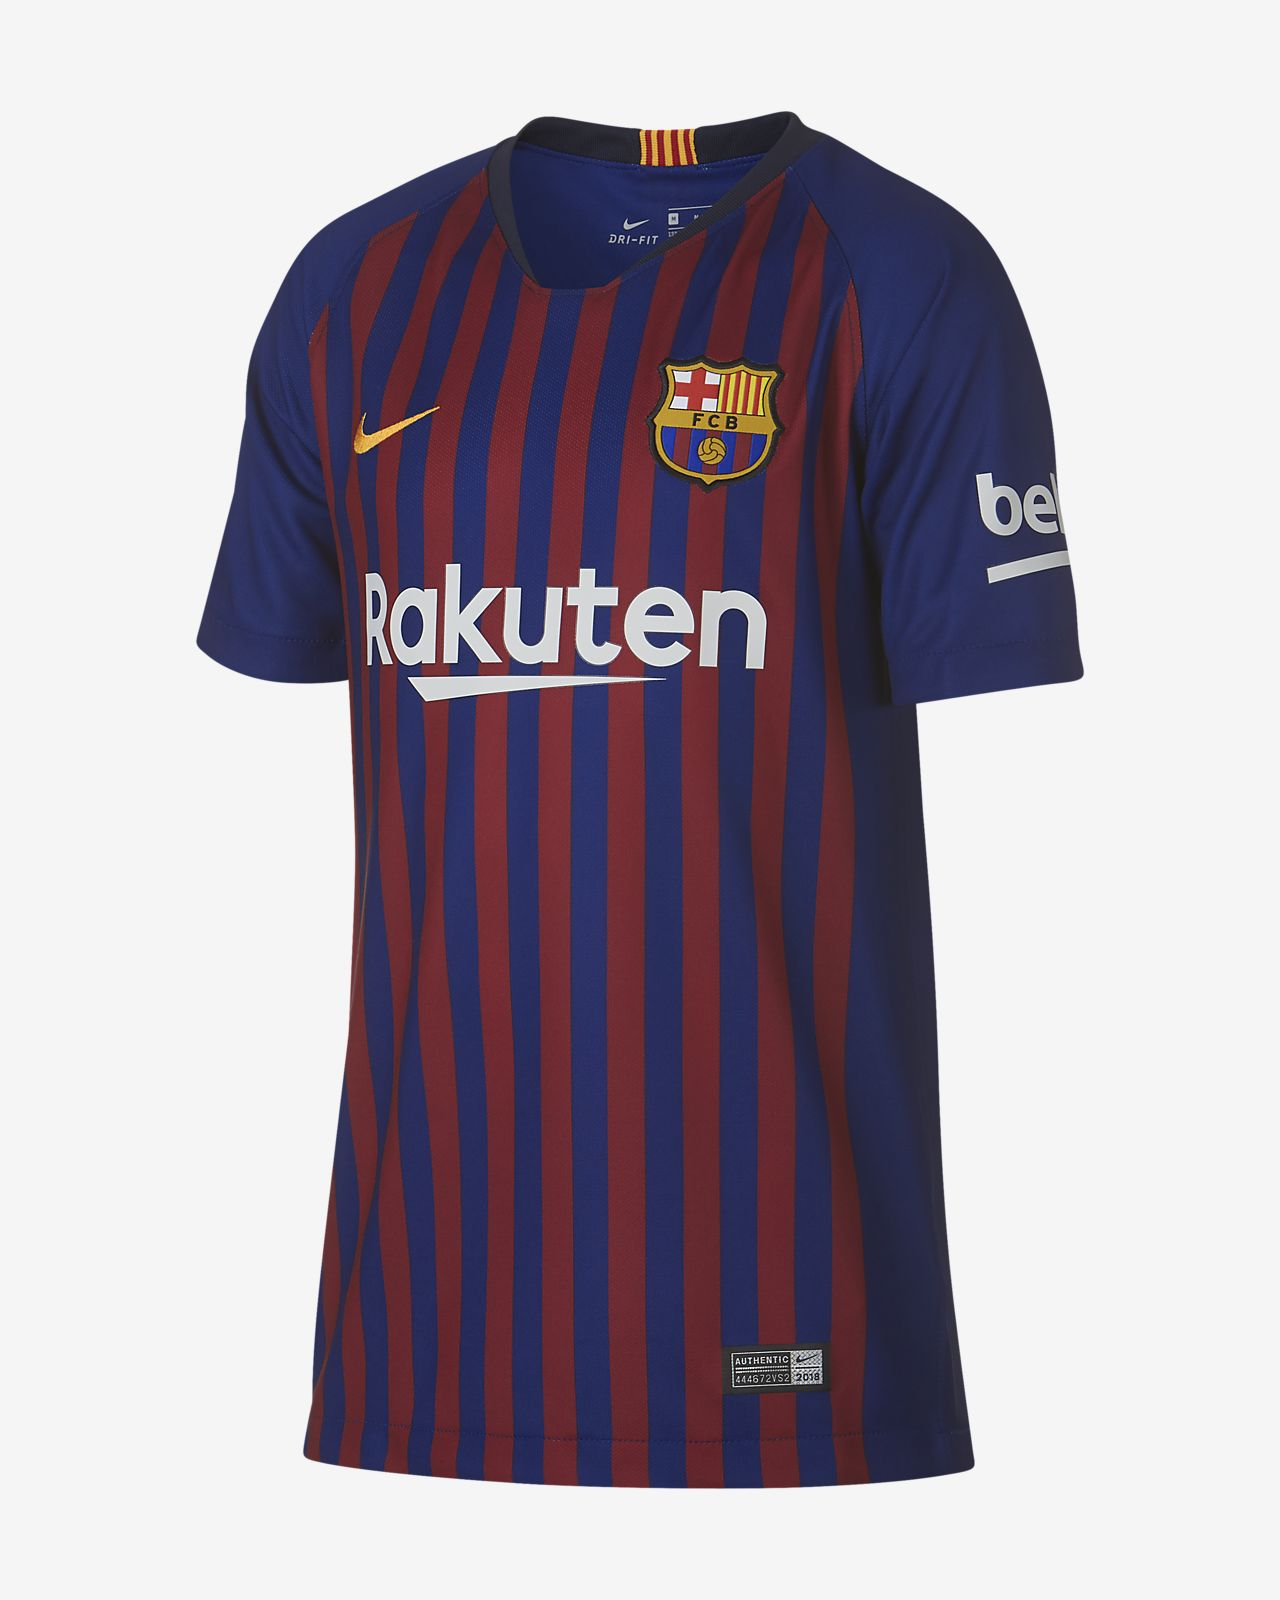 competitive price d3a14 3c4f1 2018/19 FC Barcelona Stadium Home Big Kids' Soccer Jersey